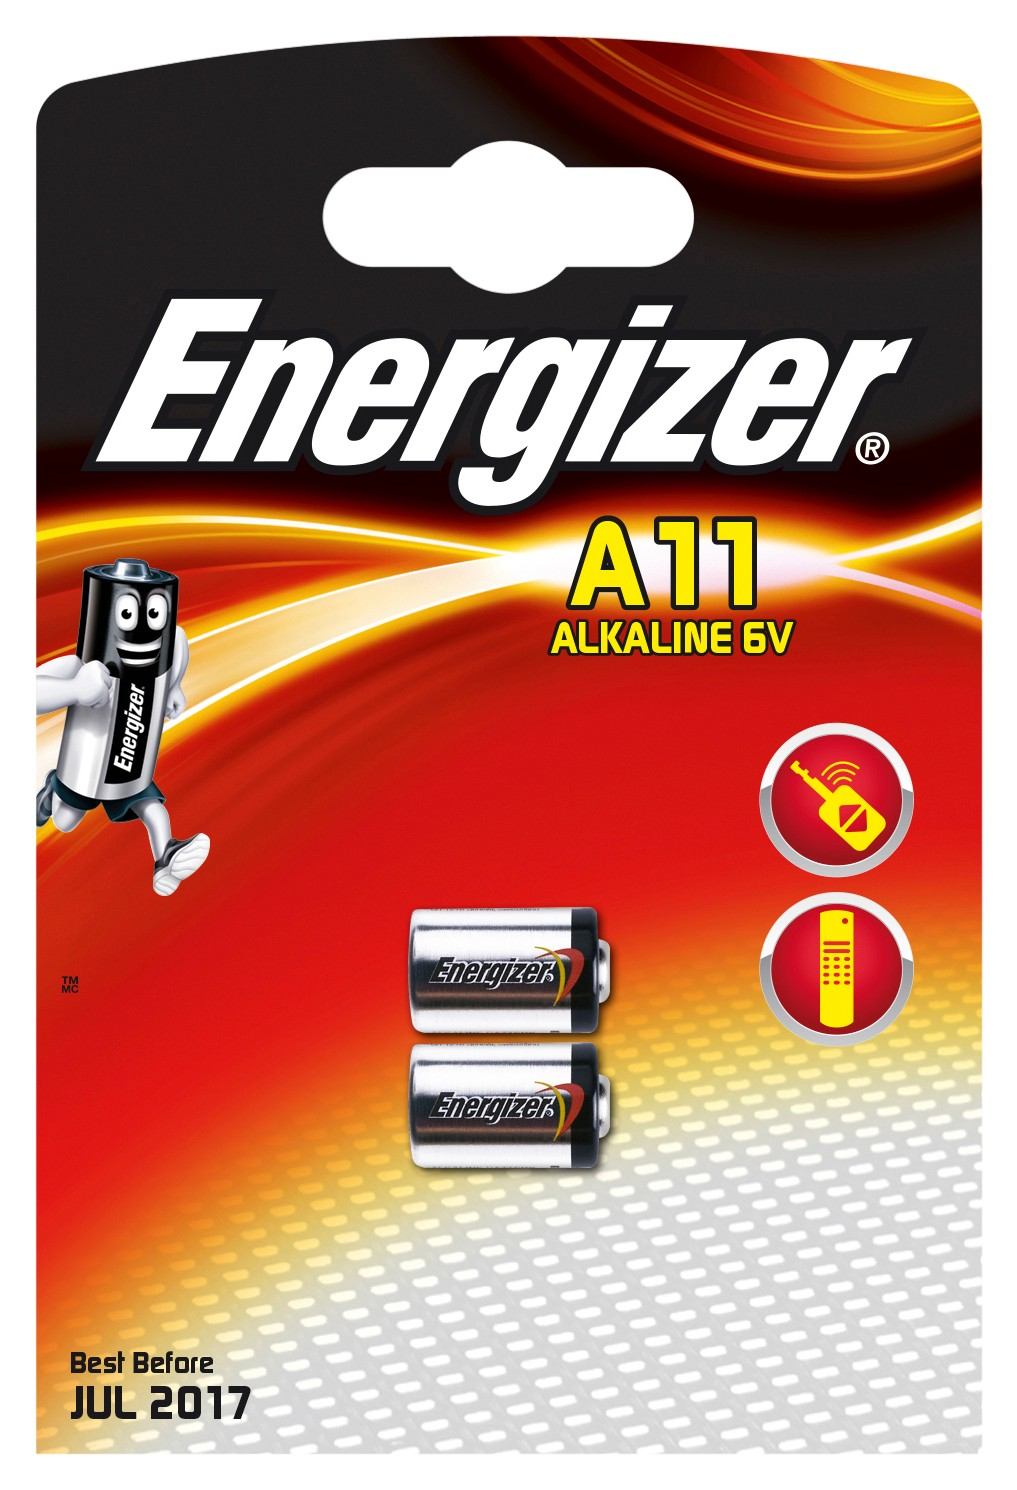 235423 : Energizer A11/E11A Alkaline batterier (2 stk)